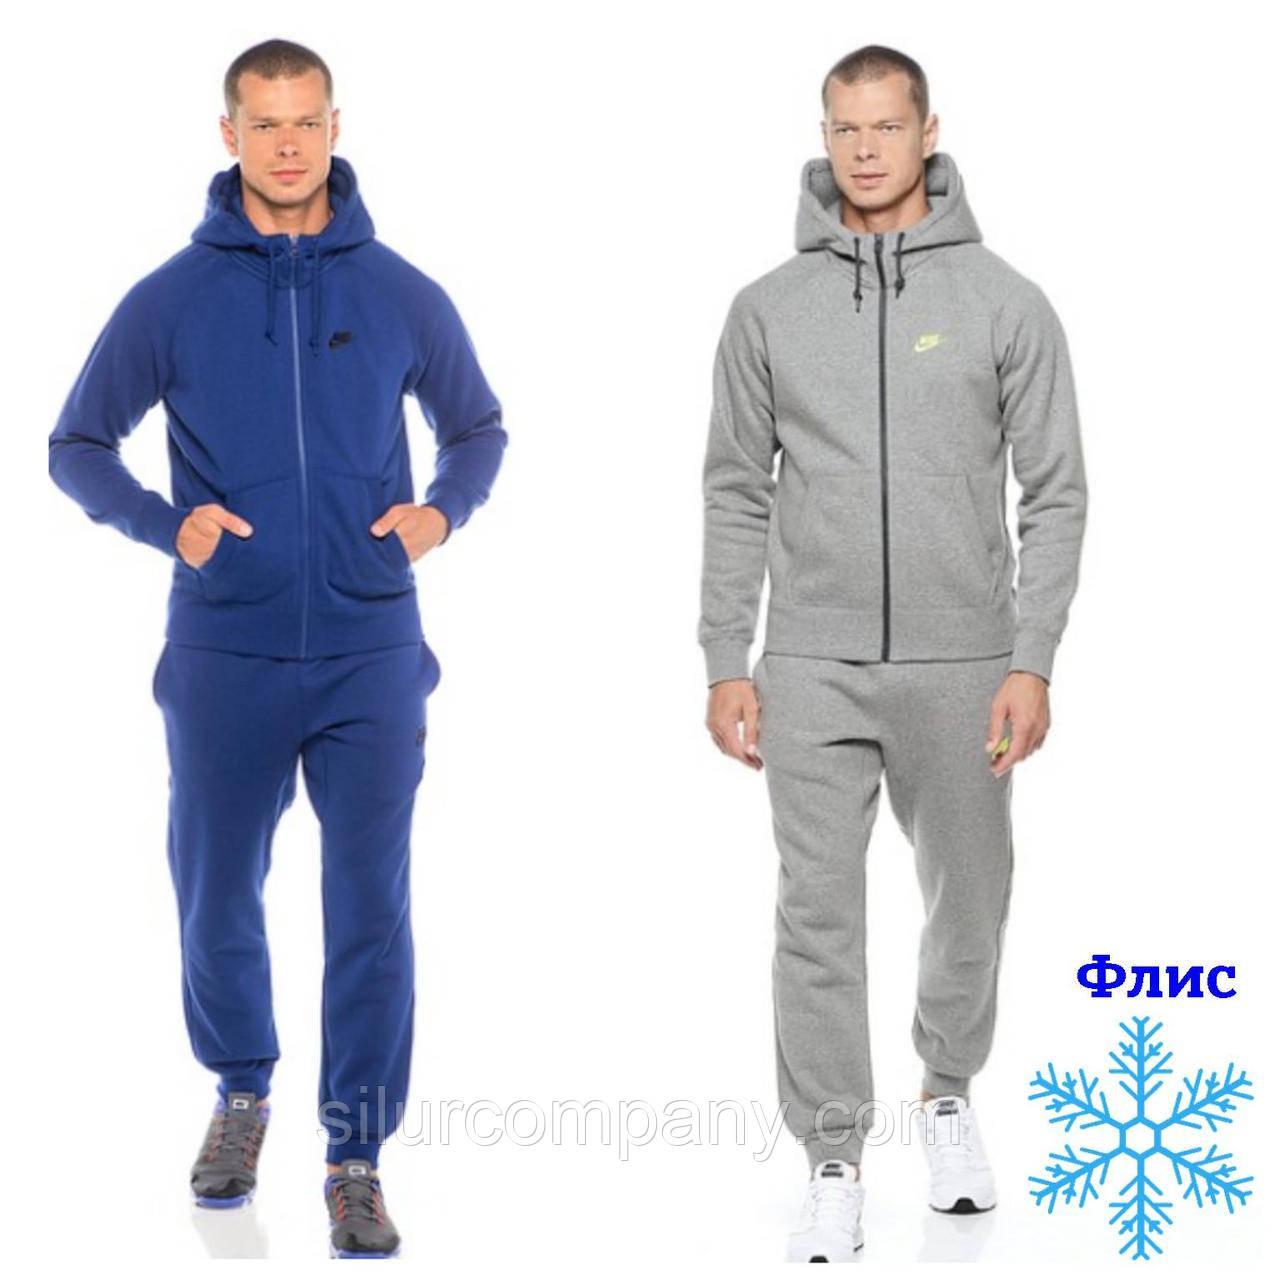 e1e6e73f Утепленный мужской спортивный костюм Nike - Интернет магазин